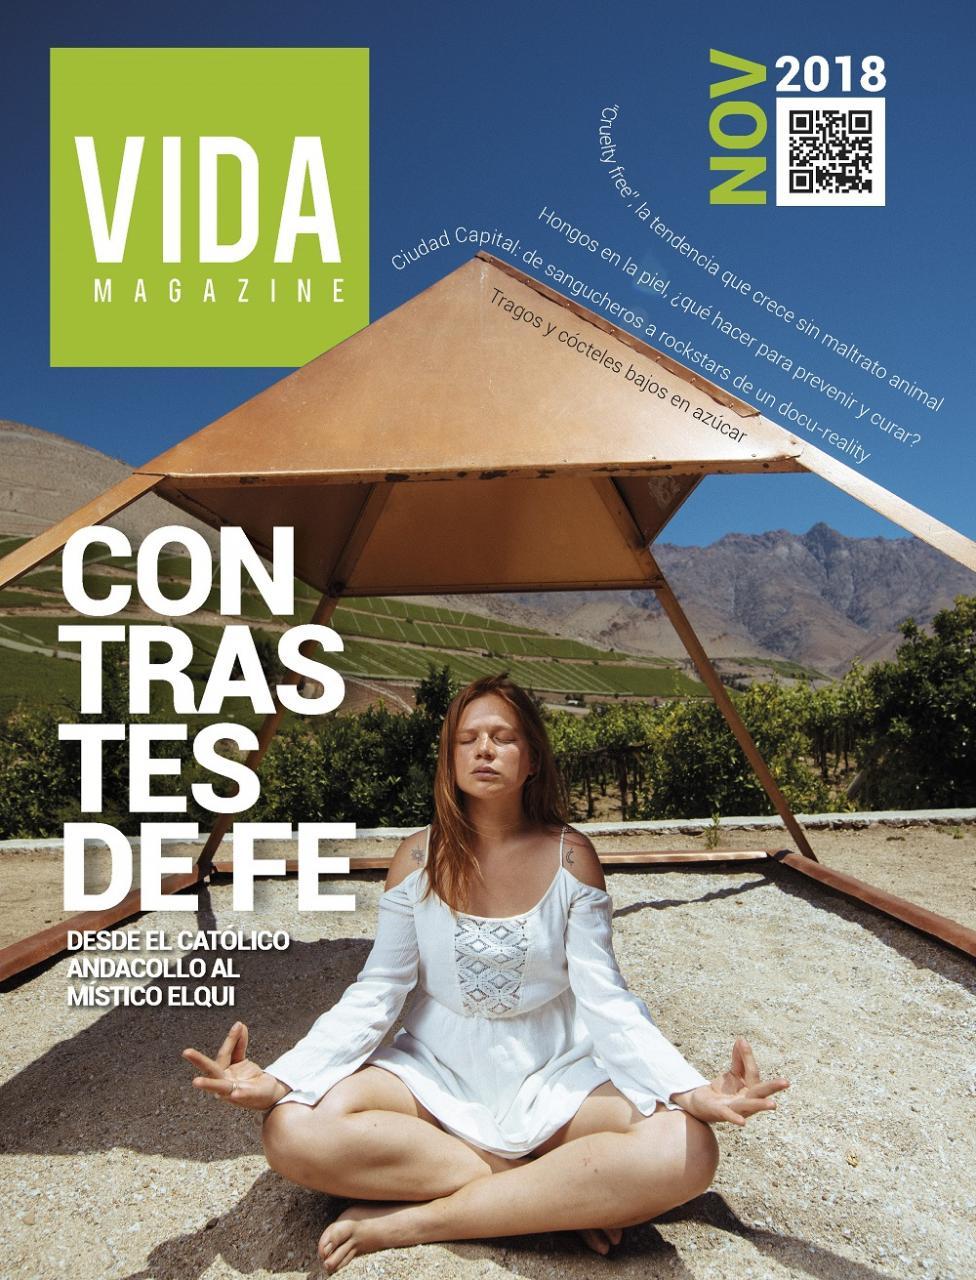 vida-magazine-edicion-n-50